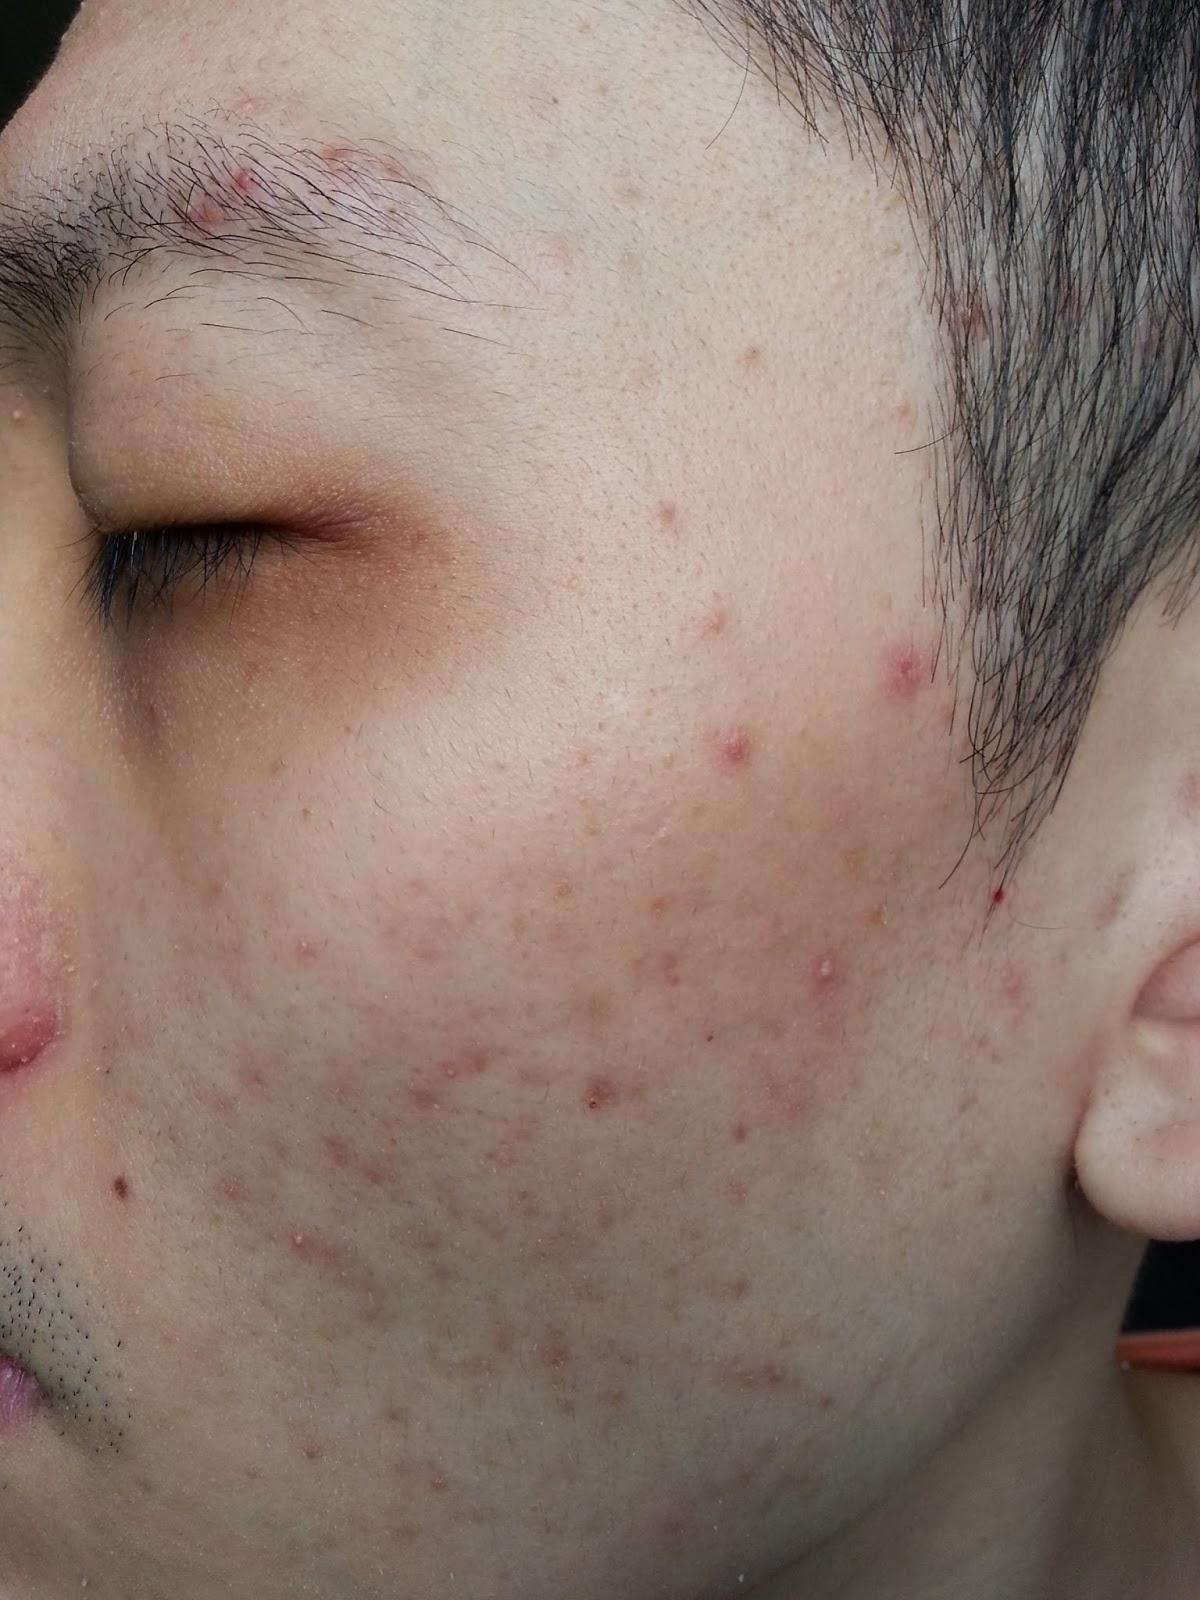 provigil itchy skin